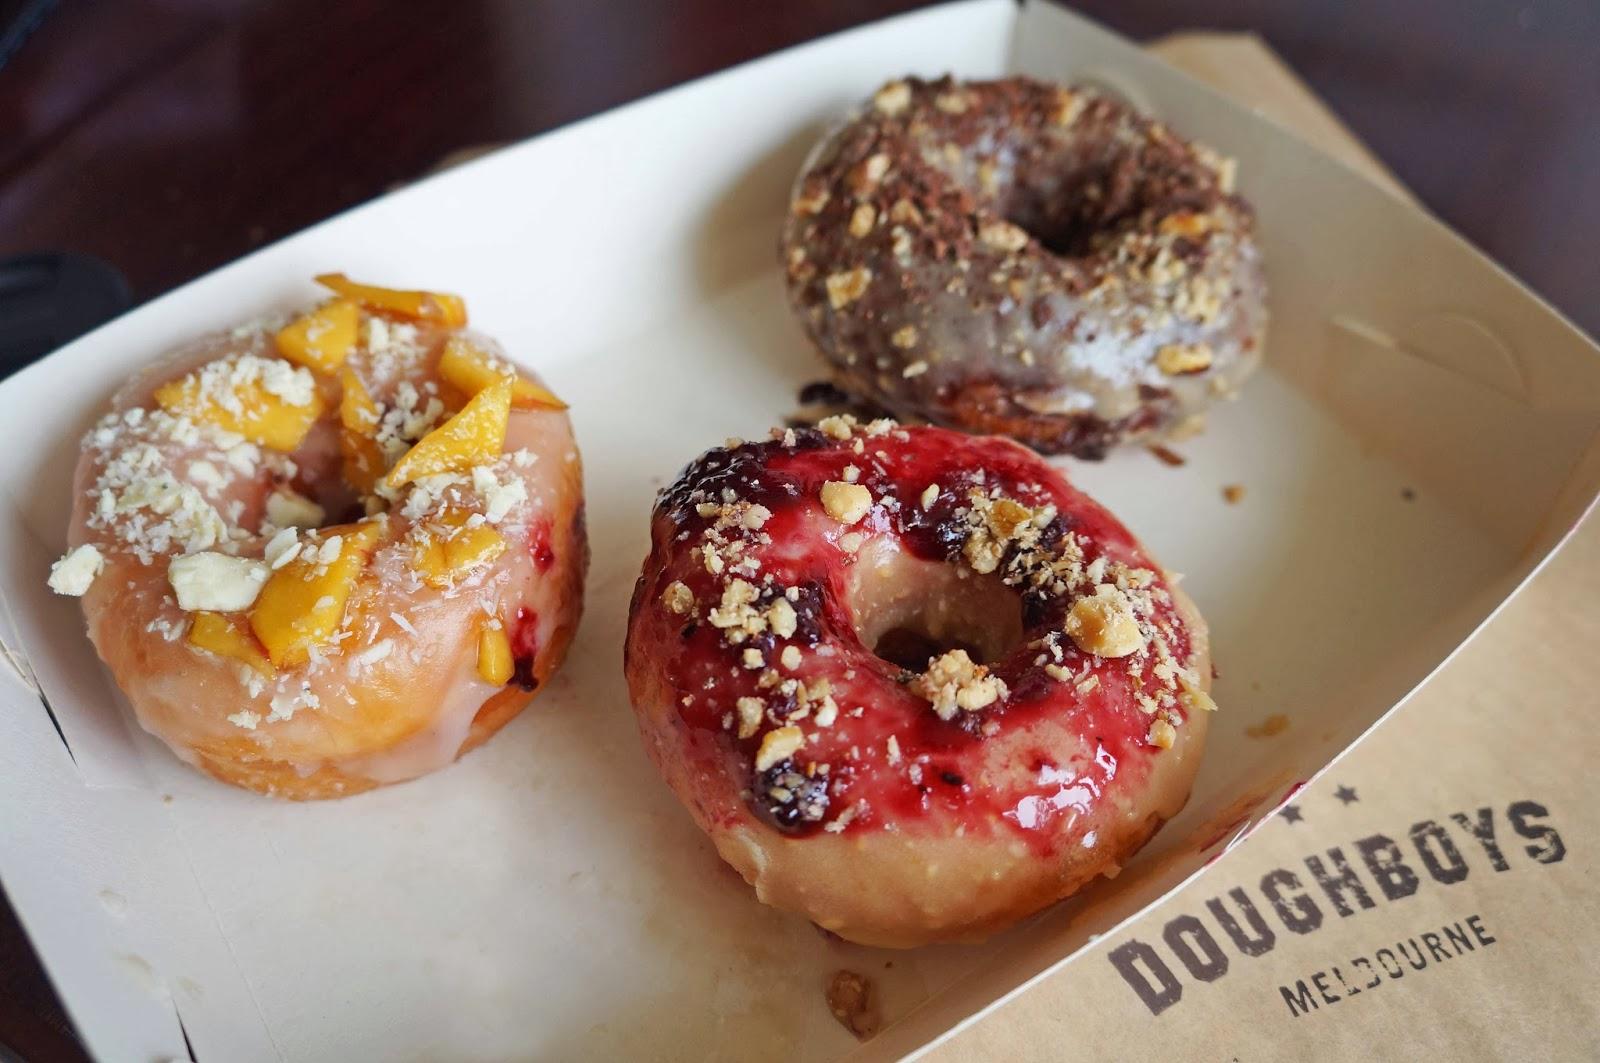 [Image: doughboy+donuts.jpg]